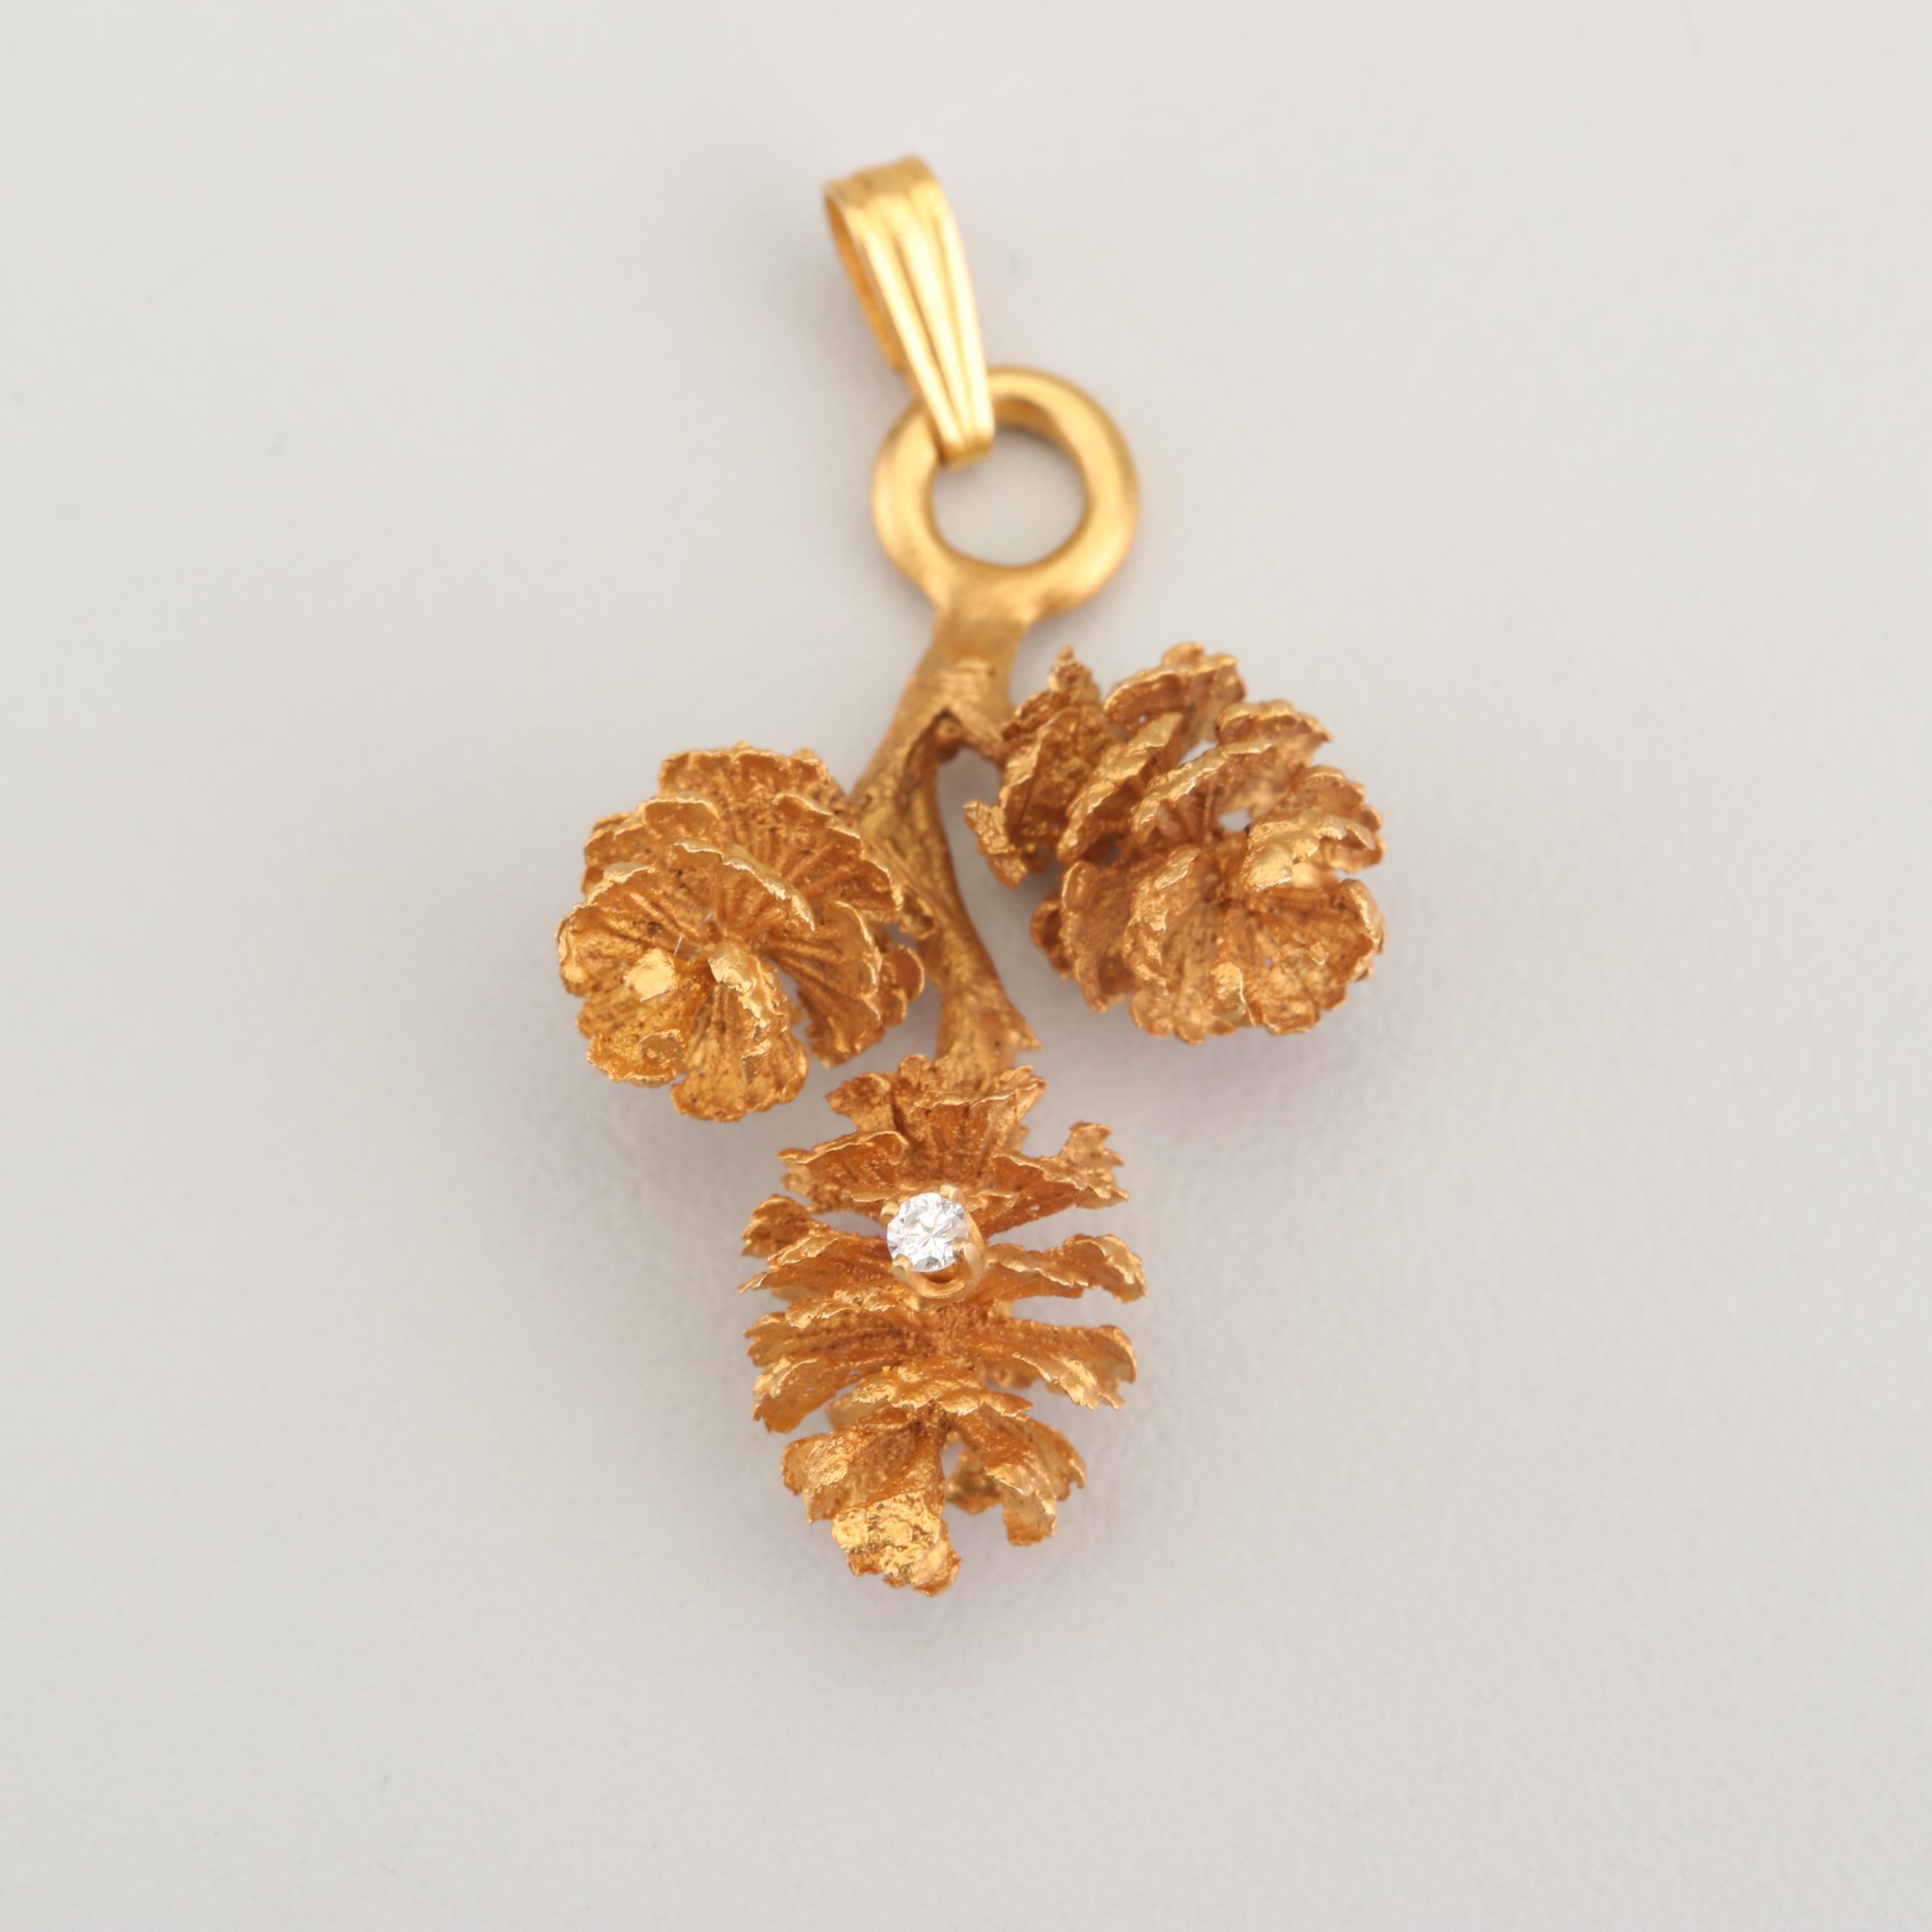 14K Yellow Gold and Diamond Pine Cone Pendant